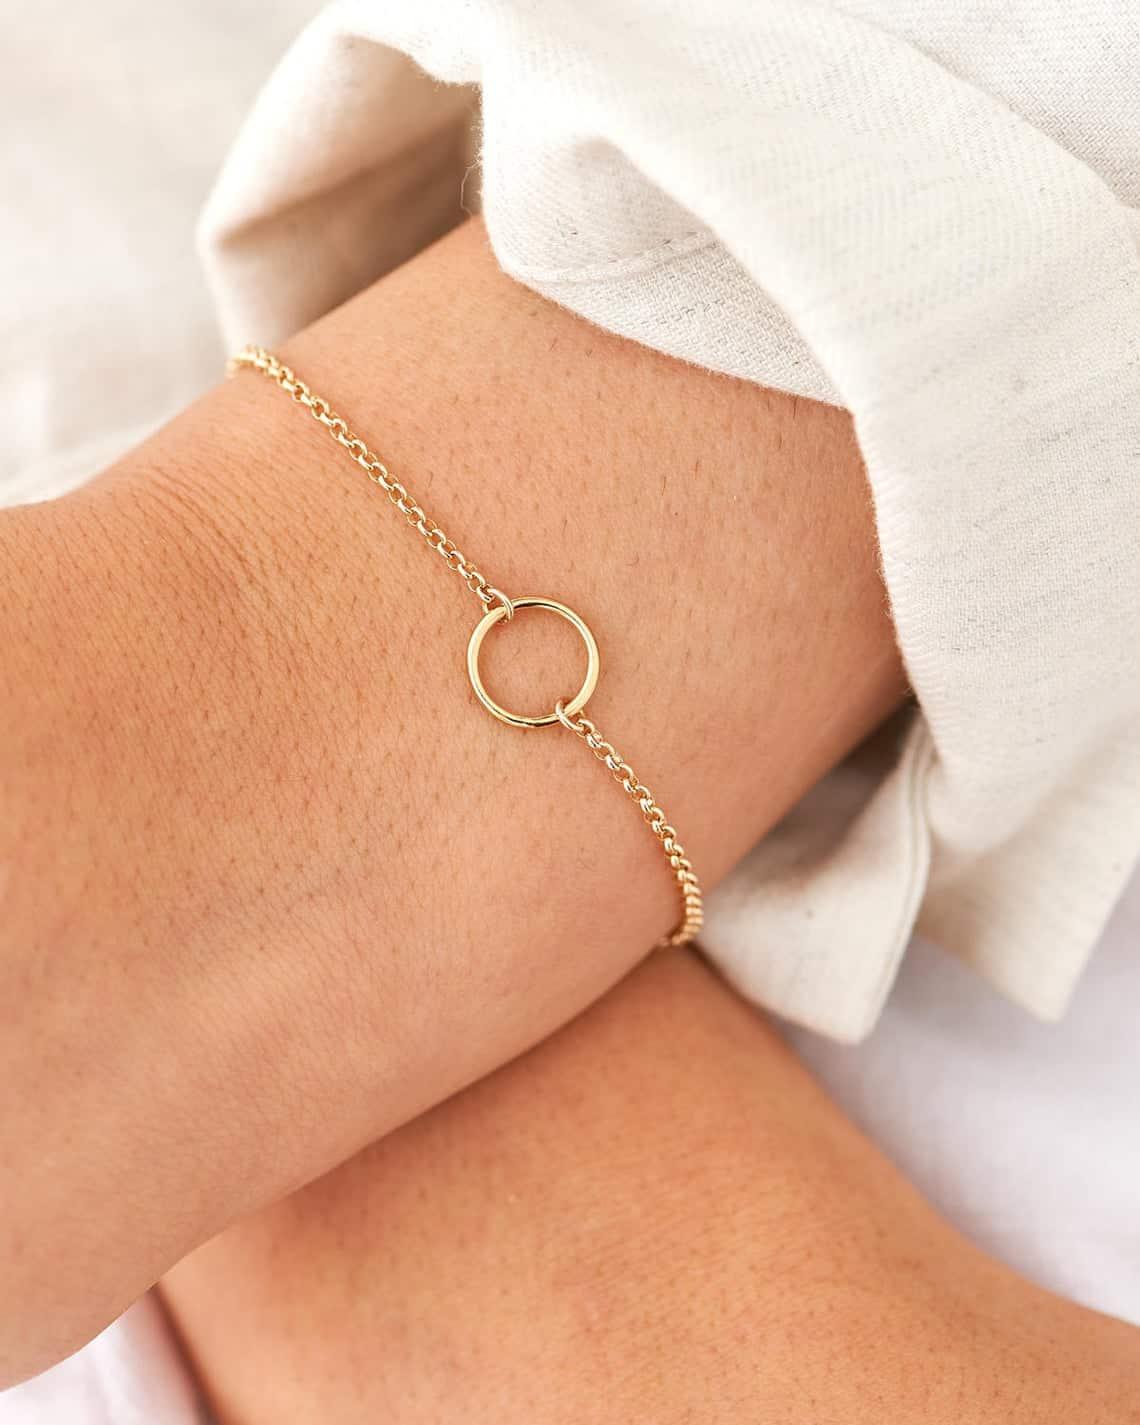 Karma circle jewellery by BlushesandGold Etsy Shop